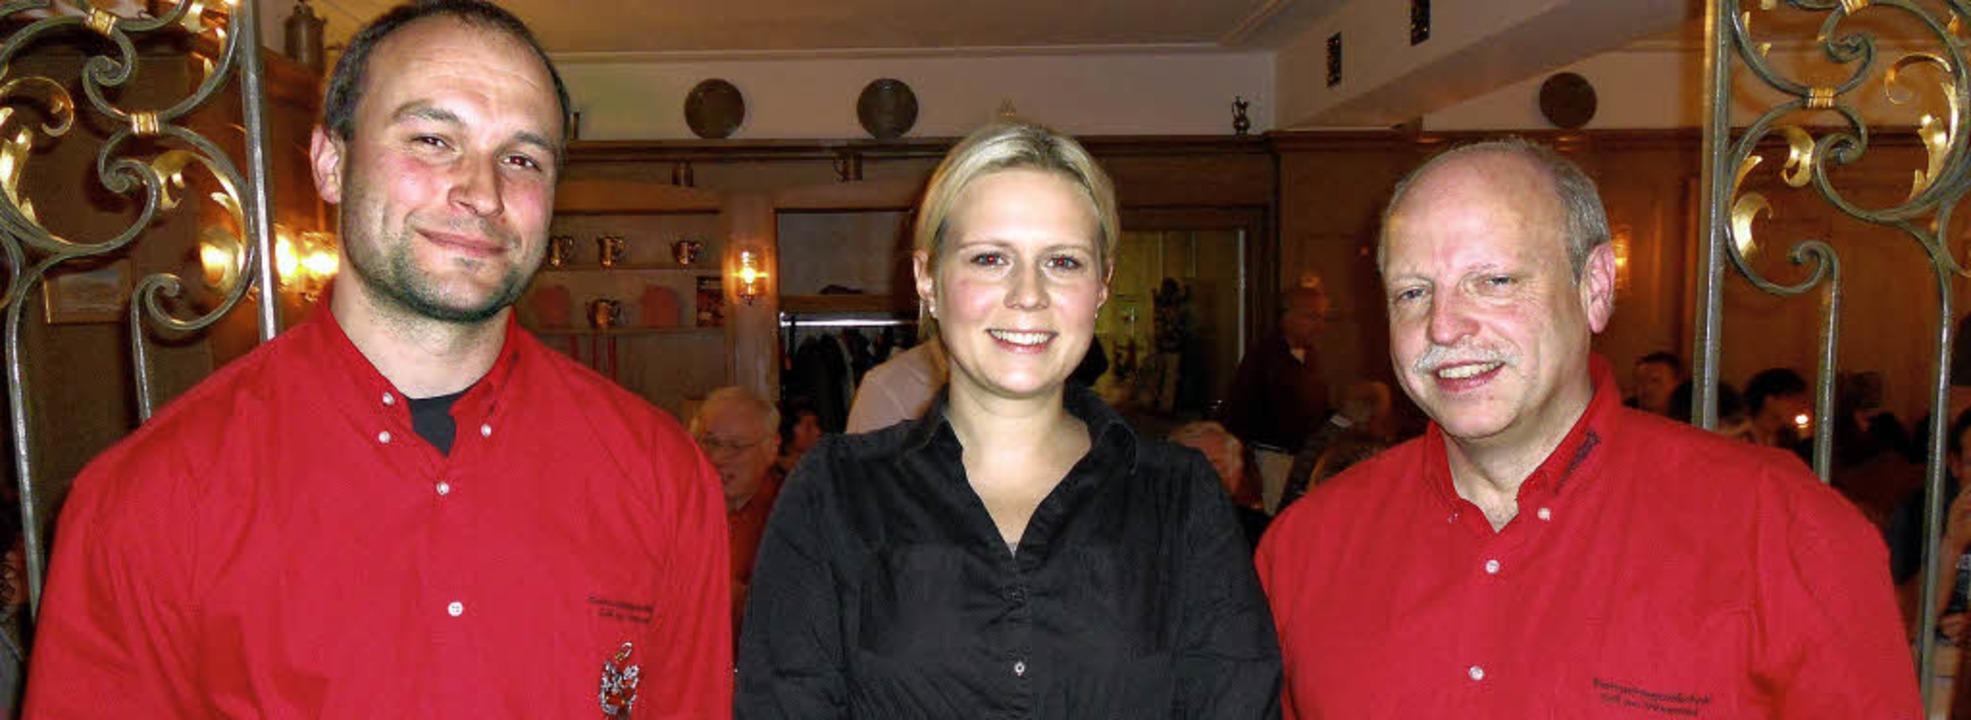 FGZ-Präsident Peter Mauthe (rechts) mi...hleith und Schatzmeister Thomas Mond.   | Foto: Paul Berger